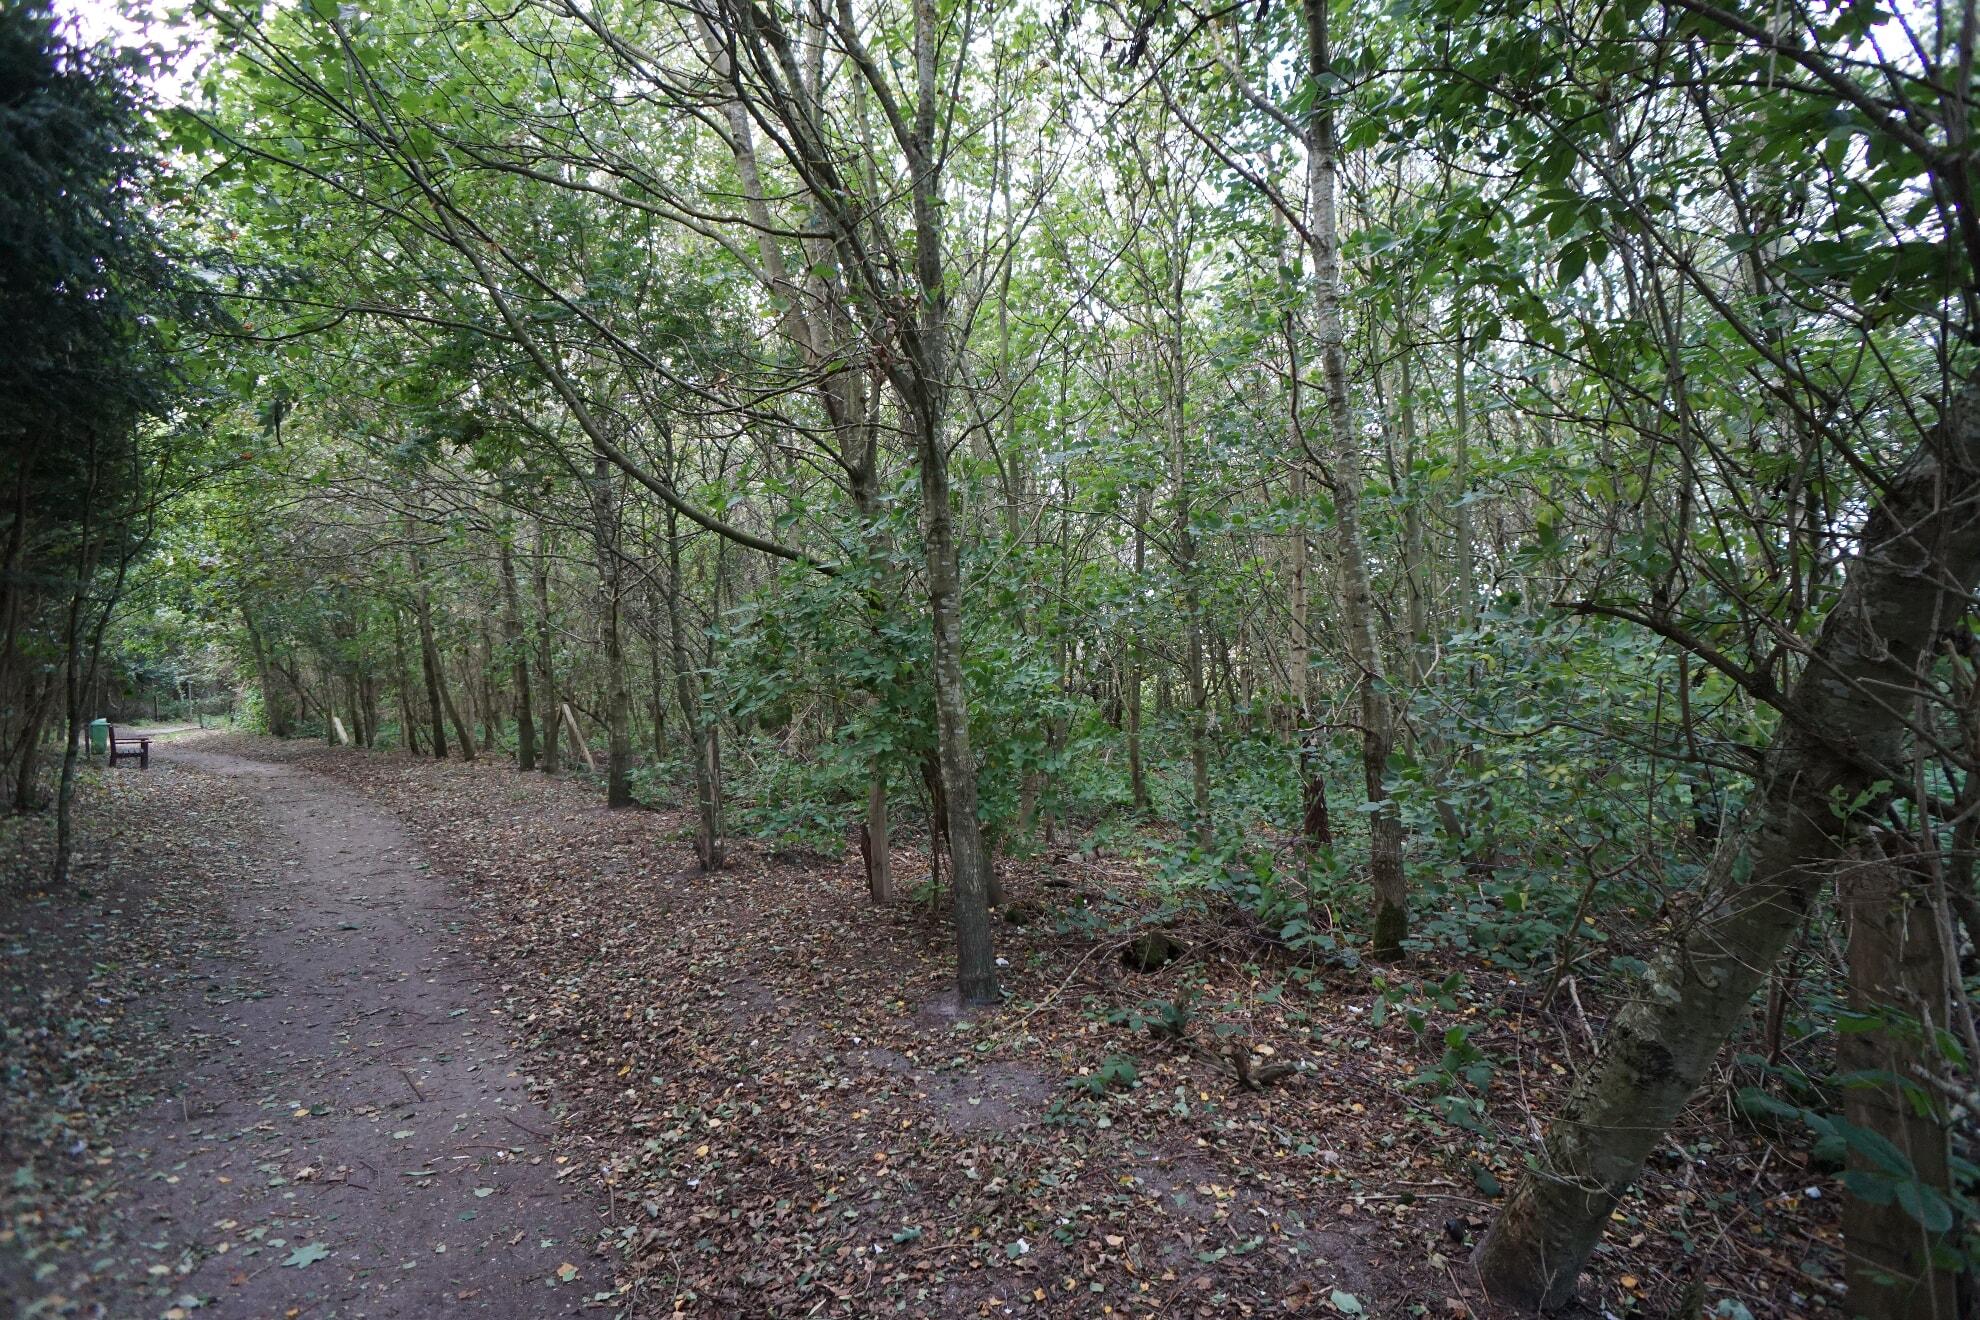 Wald am Campingplatz in Kampen